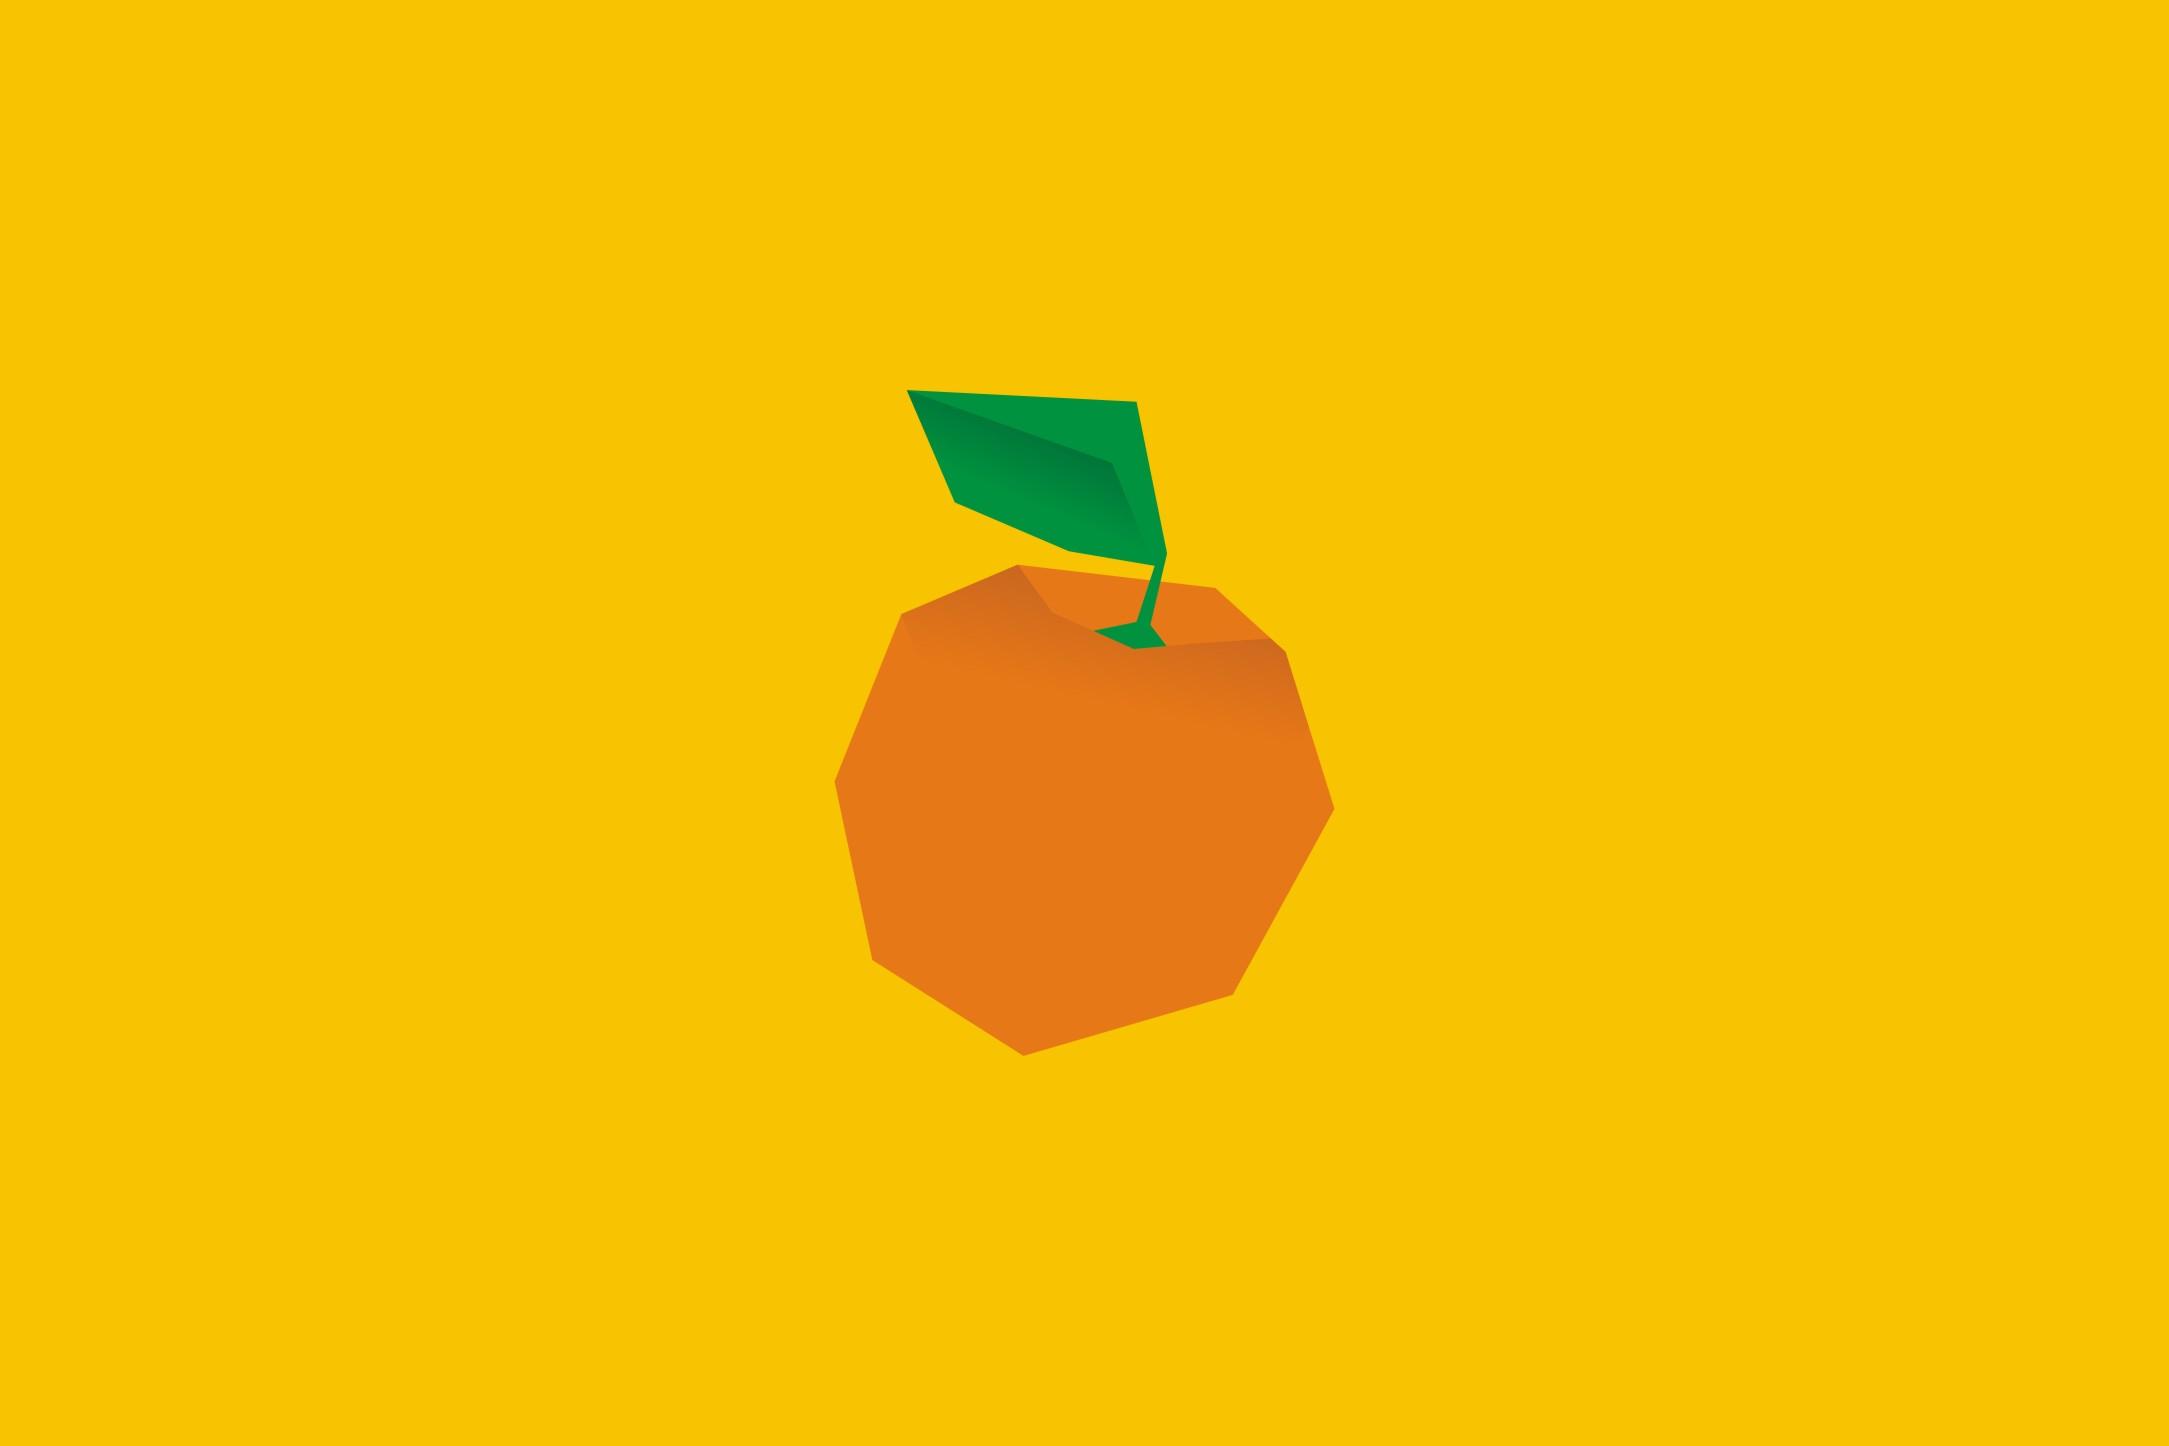 Pengen kulit kamu selalu sehat? Makan buah-buahan kaya vitamin C ya!